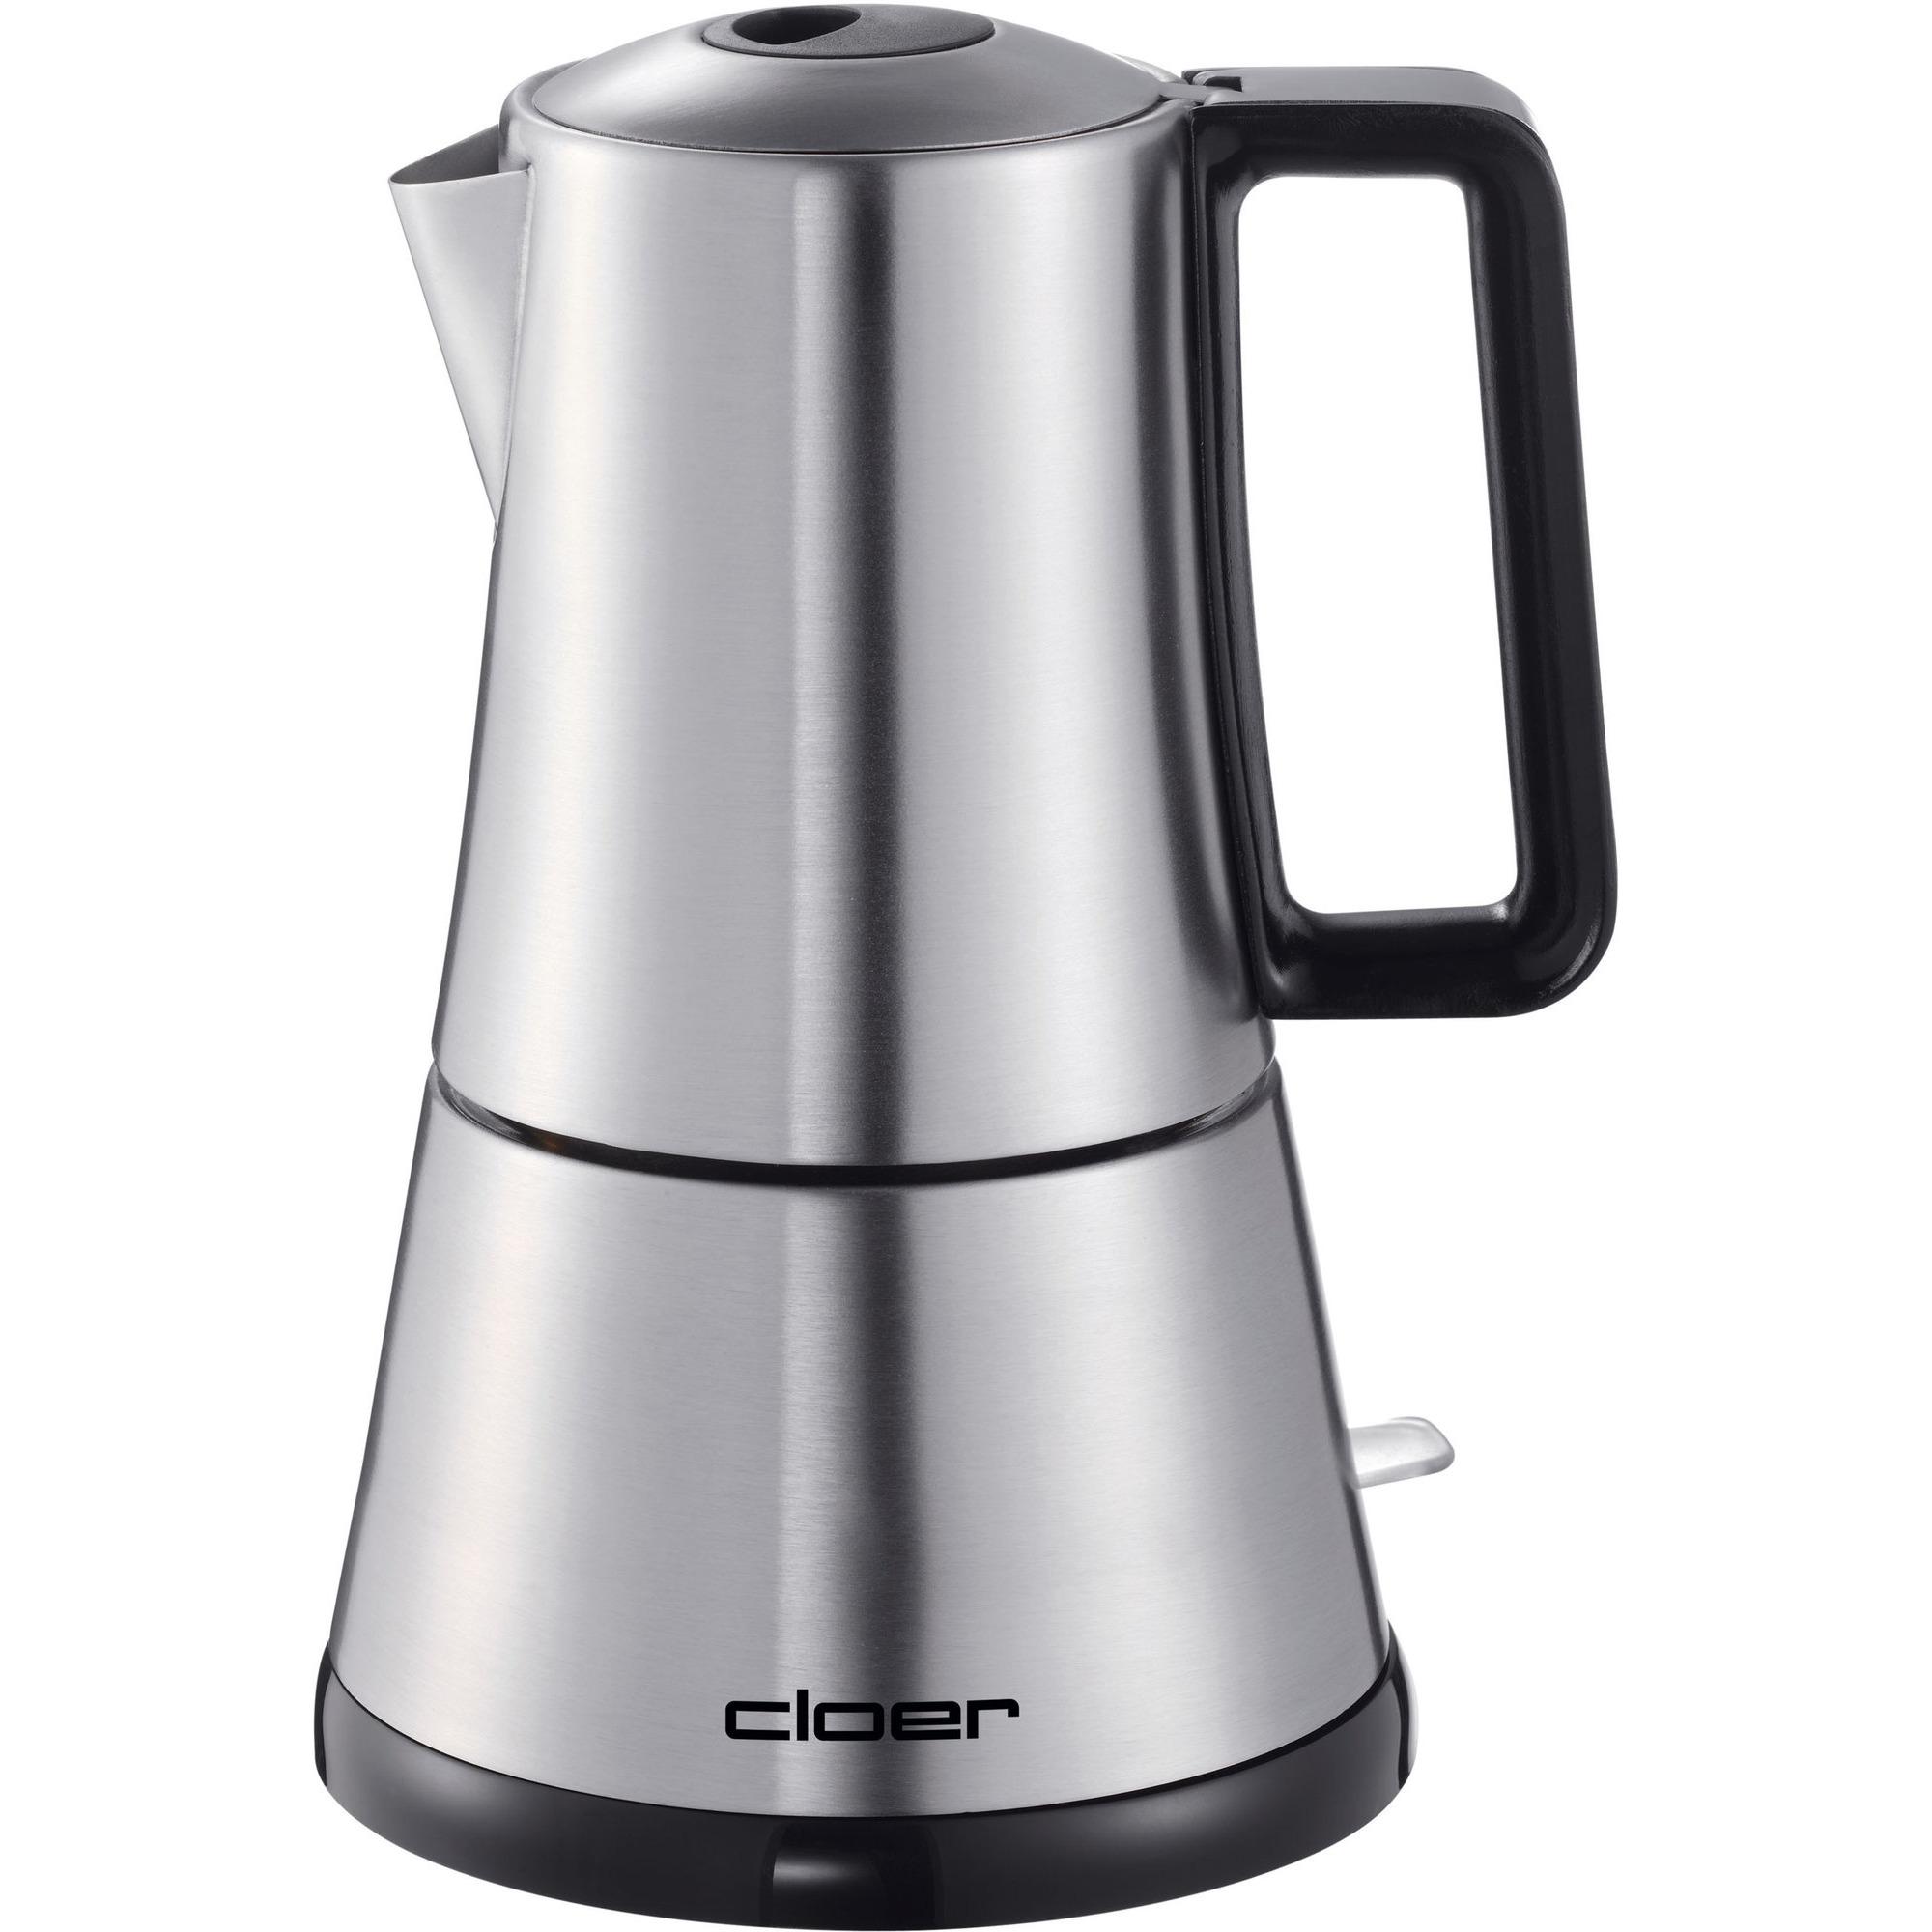 Cloer Cloer Elektrisk espressobryggare